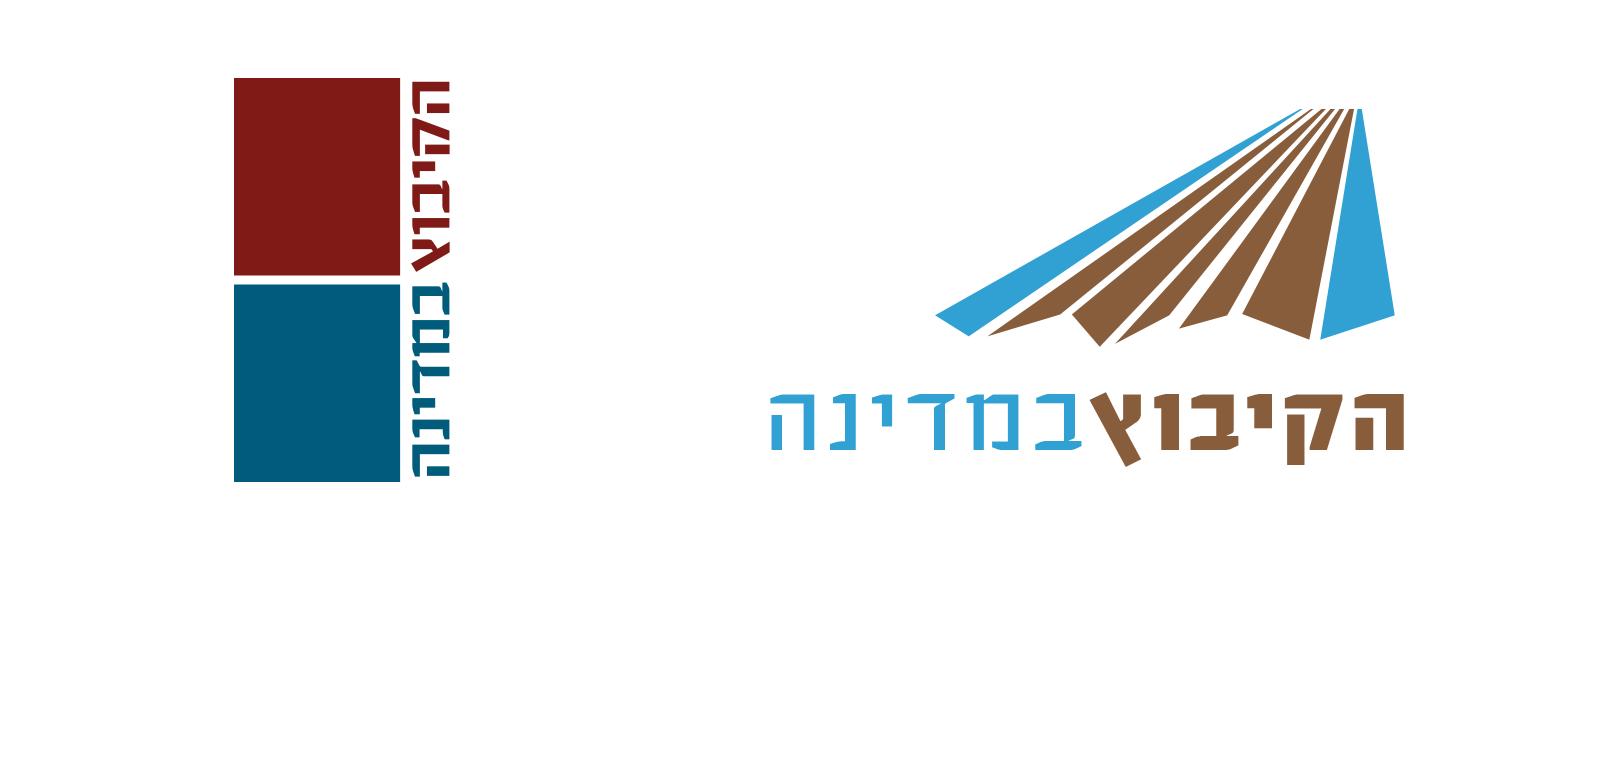 http://bigeyes.co.il/wp-content/uploads/2019/06/KibbutzBooks-logo-2.png